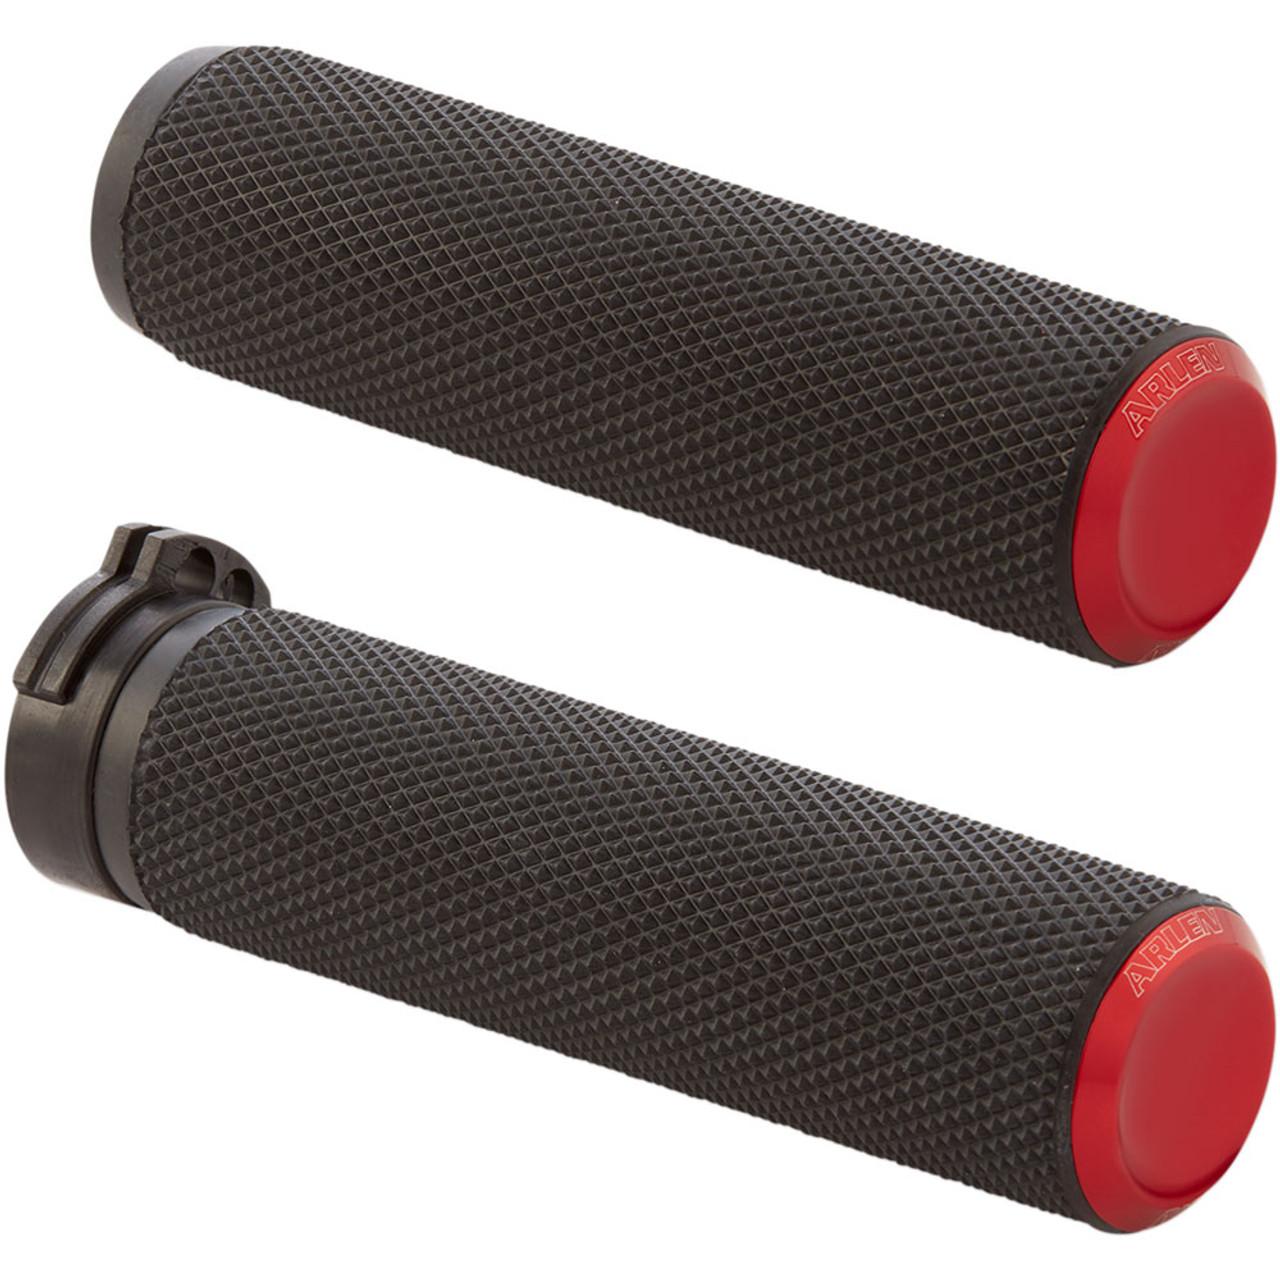 Arlen Ness Black Deep Cut Comfort Grips for Cable07-051